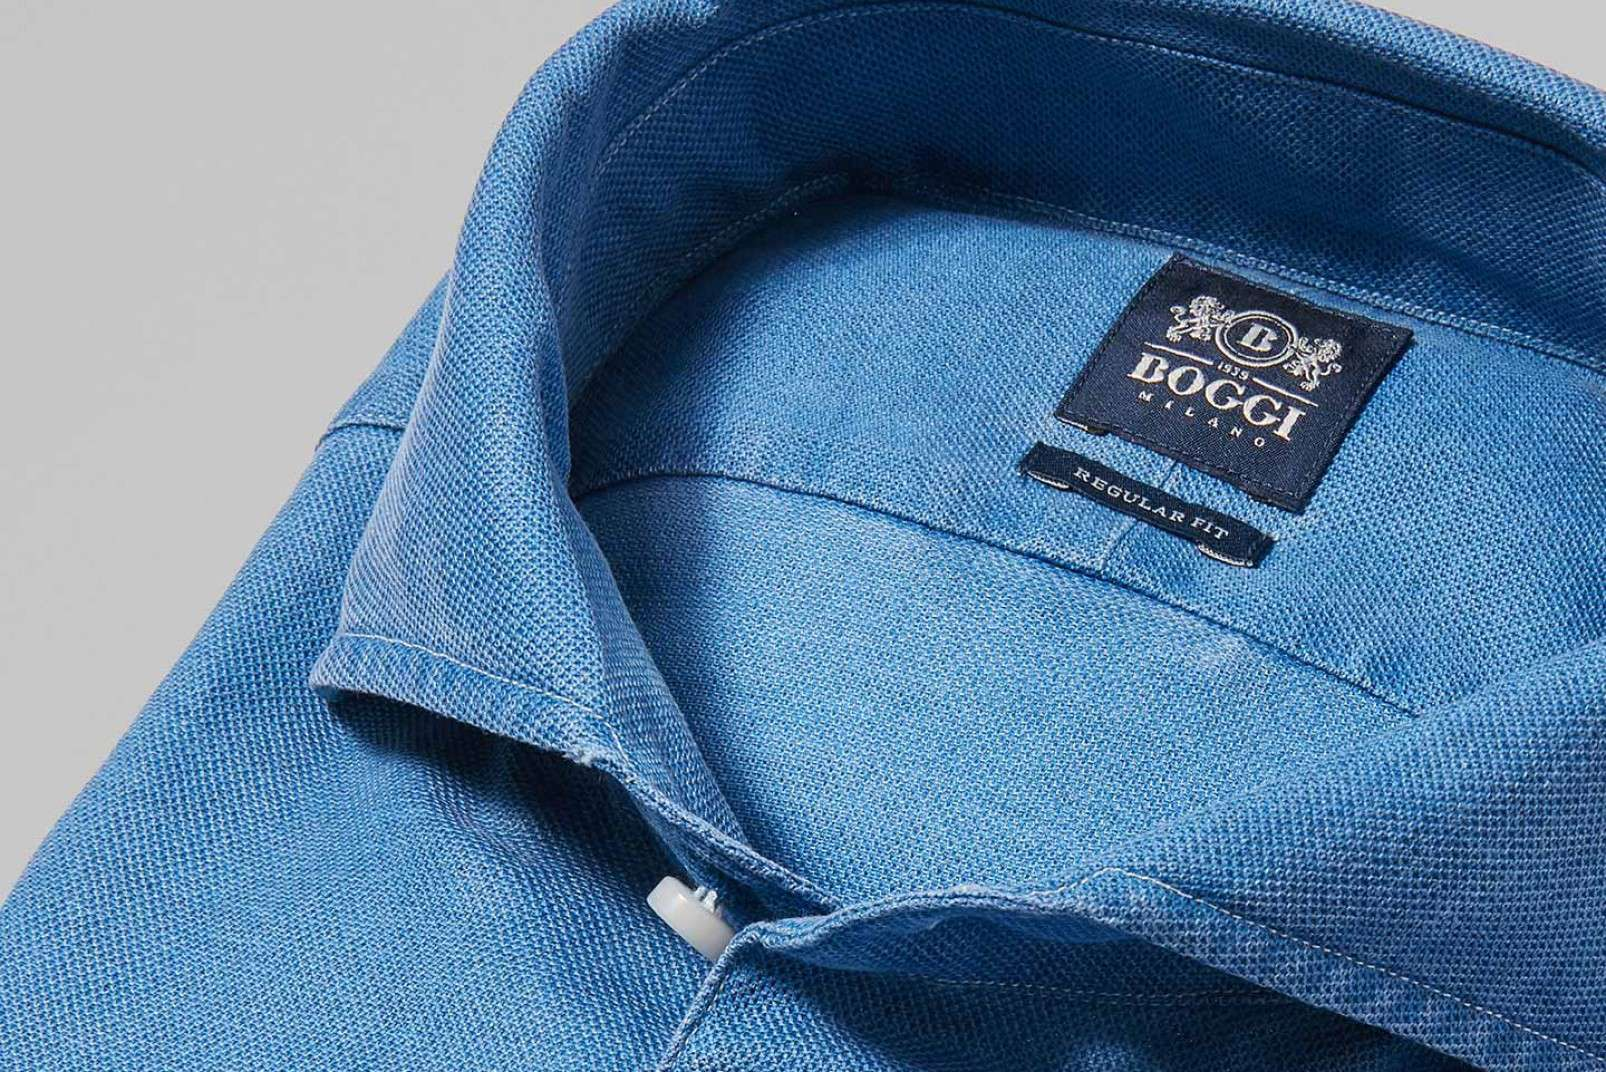 Cornflower blue shirt with Bowling collar BO19P000303